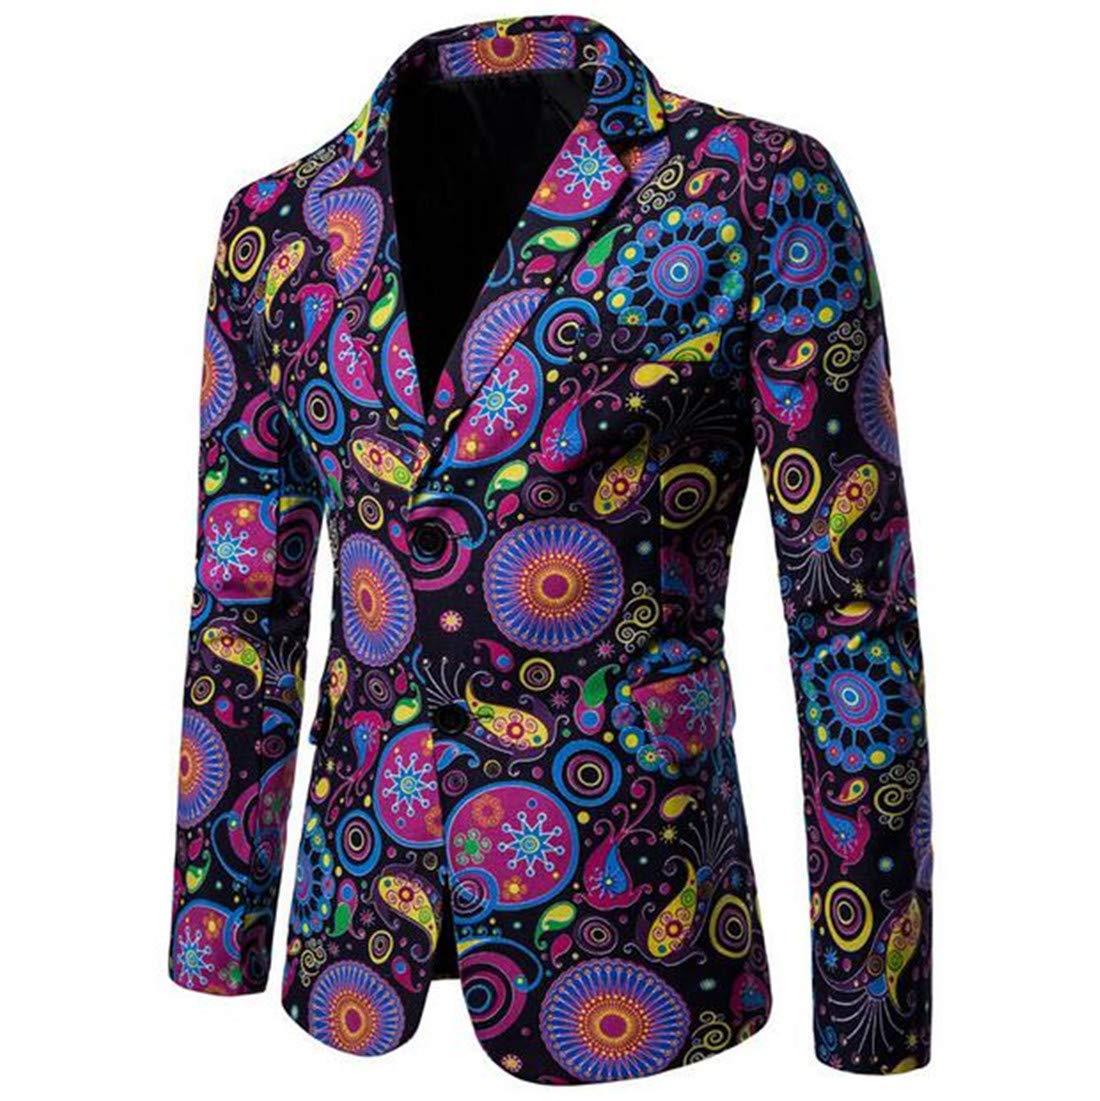 Domple Mens Linen Cotton Long Sleeve Ethnic Print African Blazer Jacket Aspic US XS